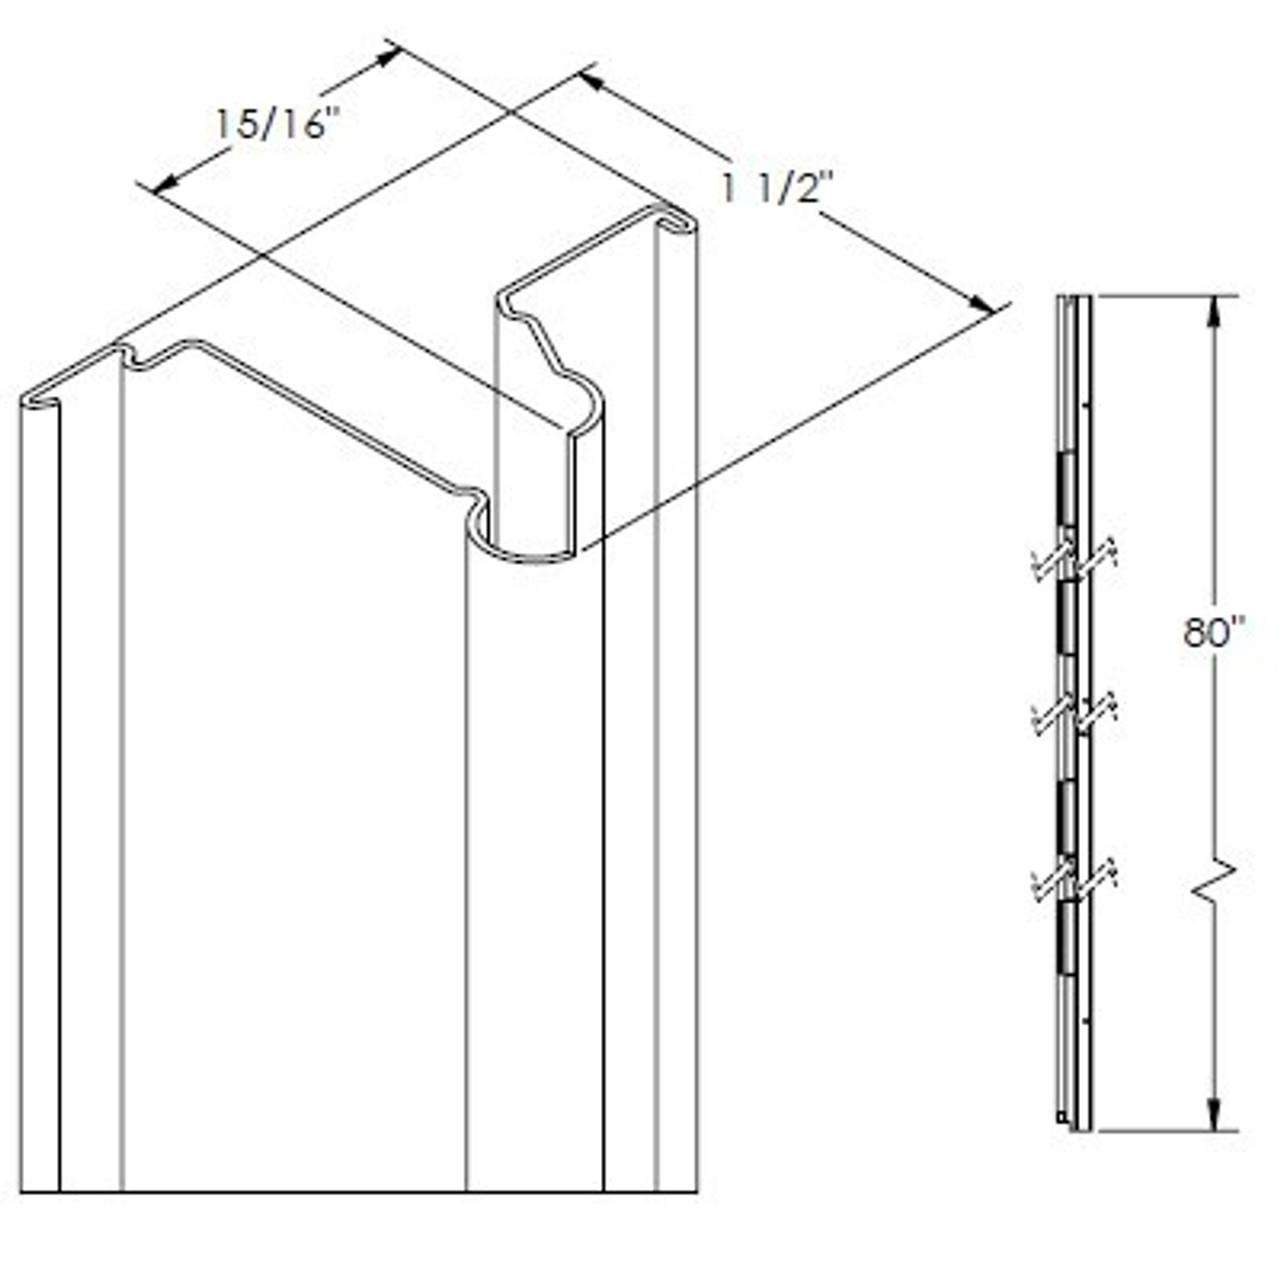 Picture of: White Hinge Rail For 80 Inch Door Older Model